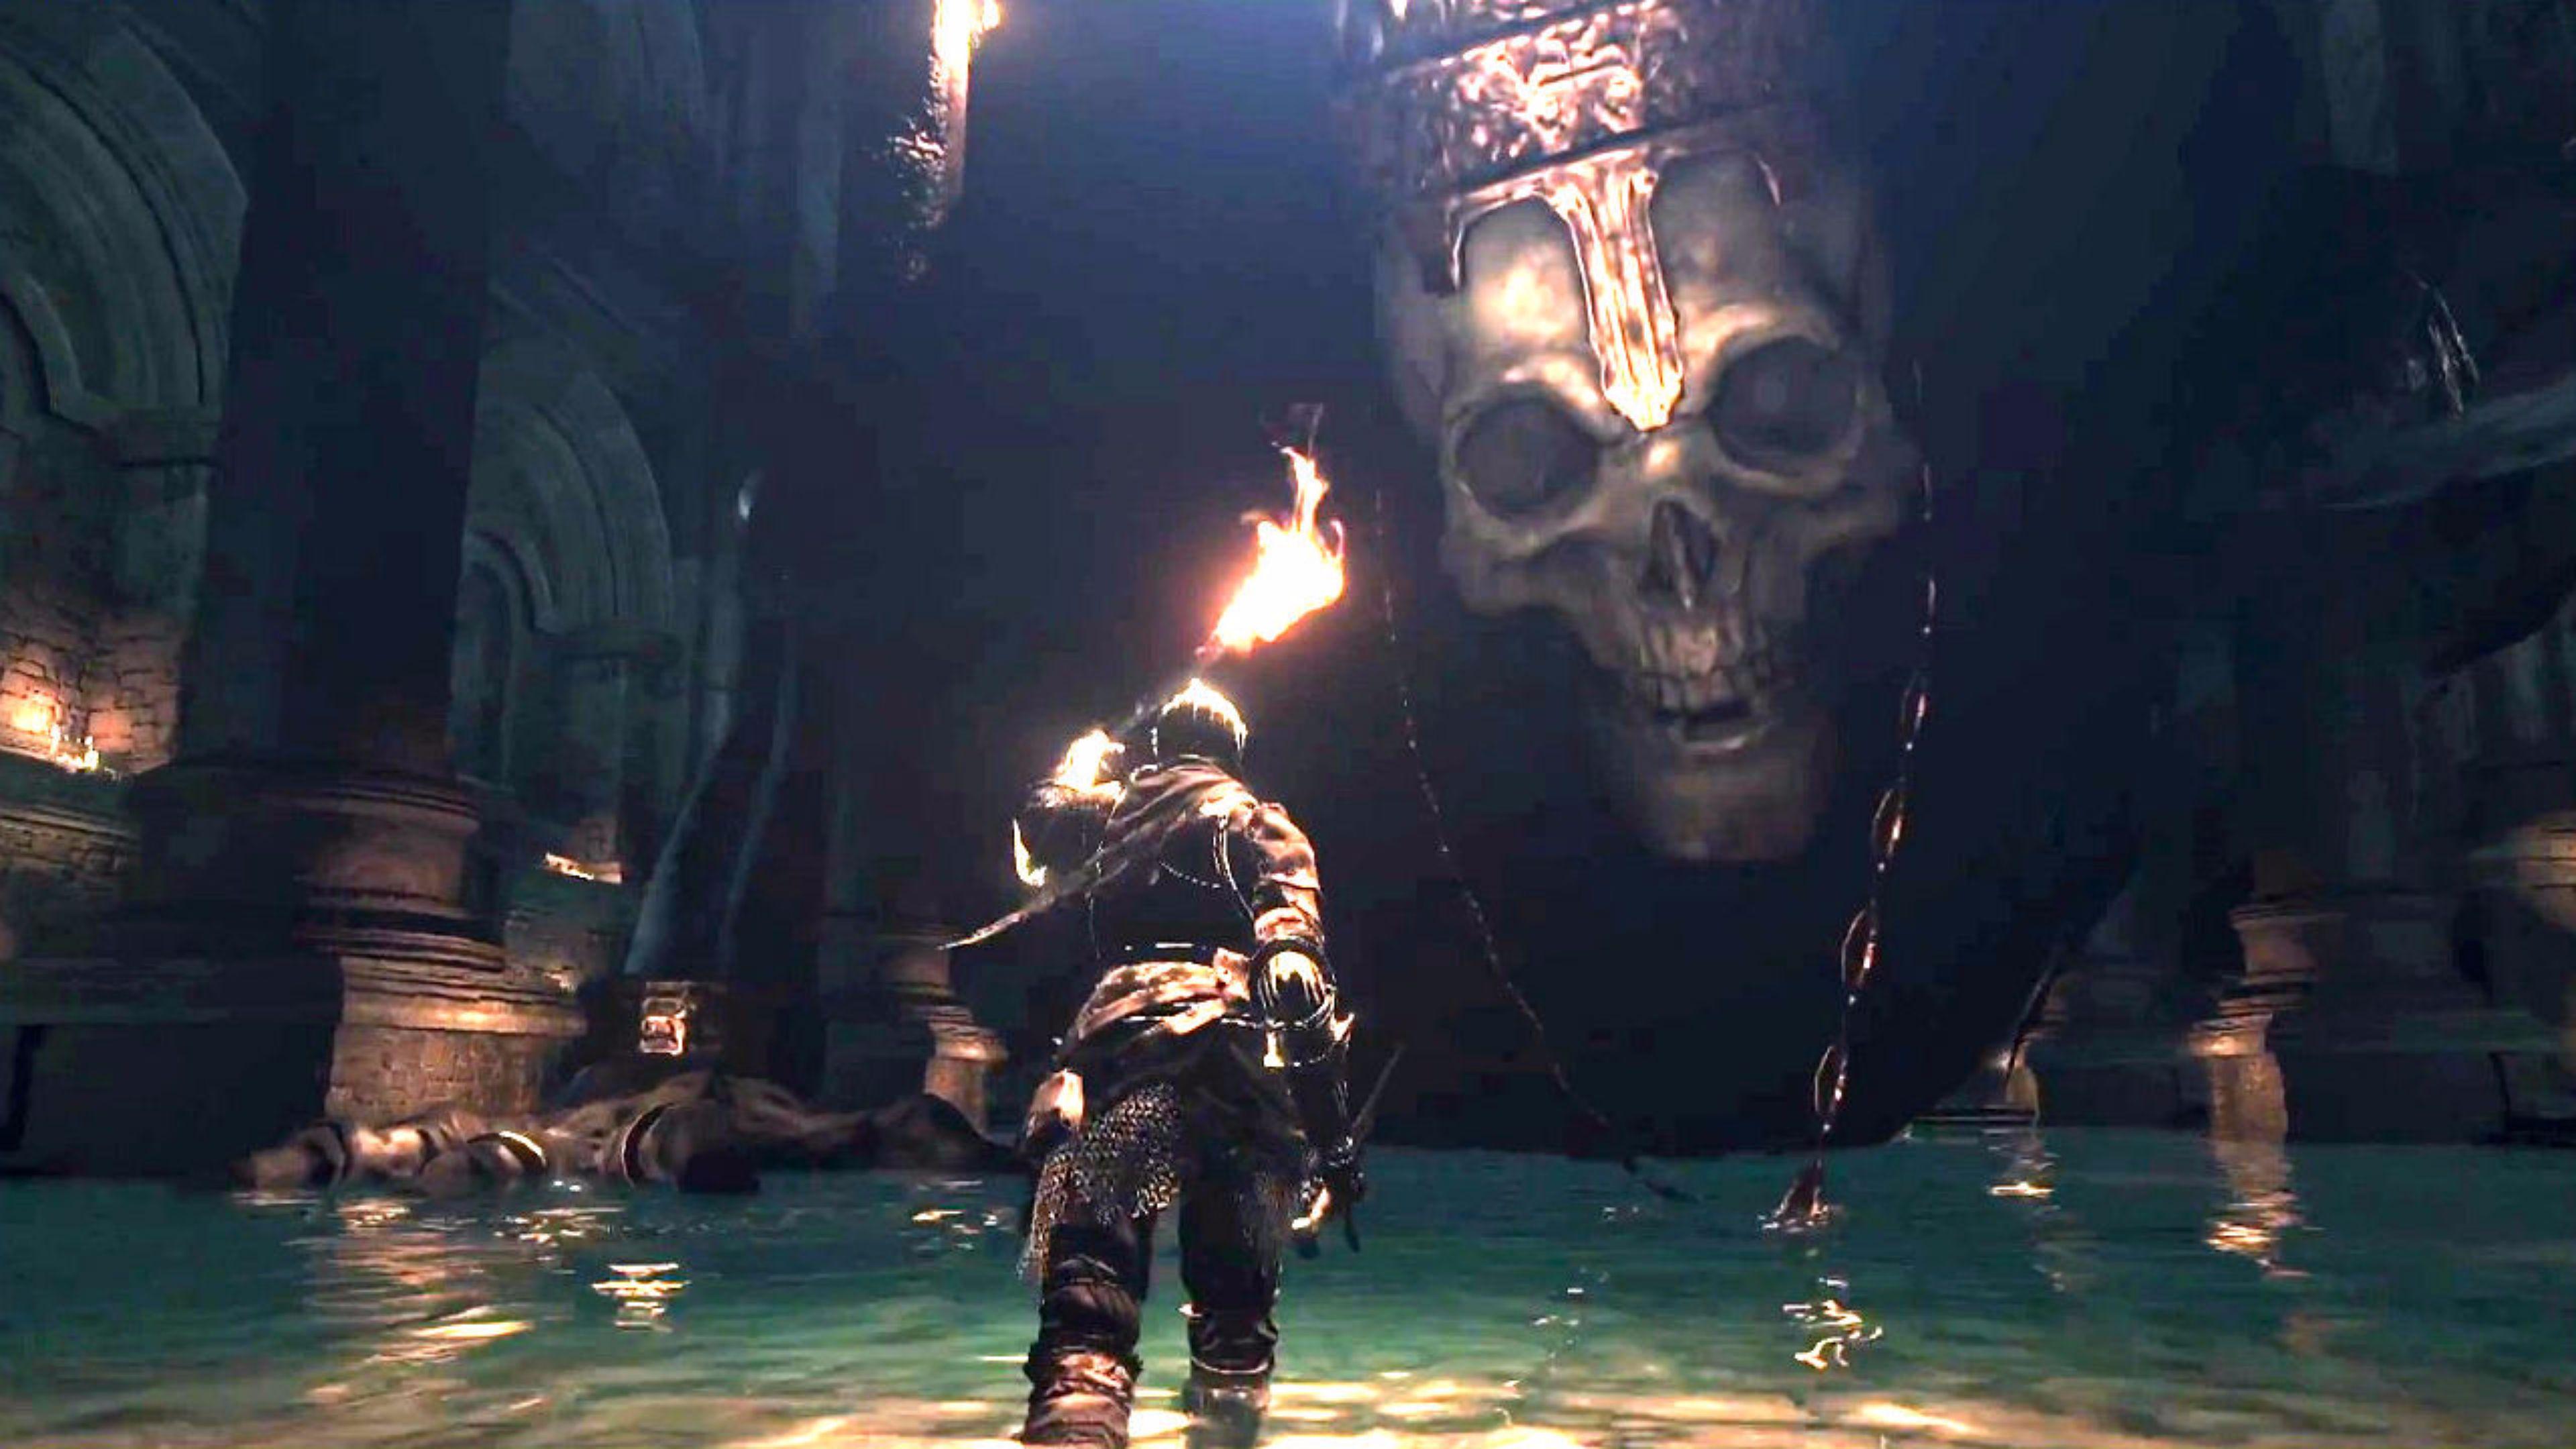 Game of the Year Dark Souls 3 4K Wallpapers 4K Wallpaper 3840x2160